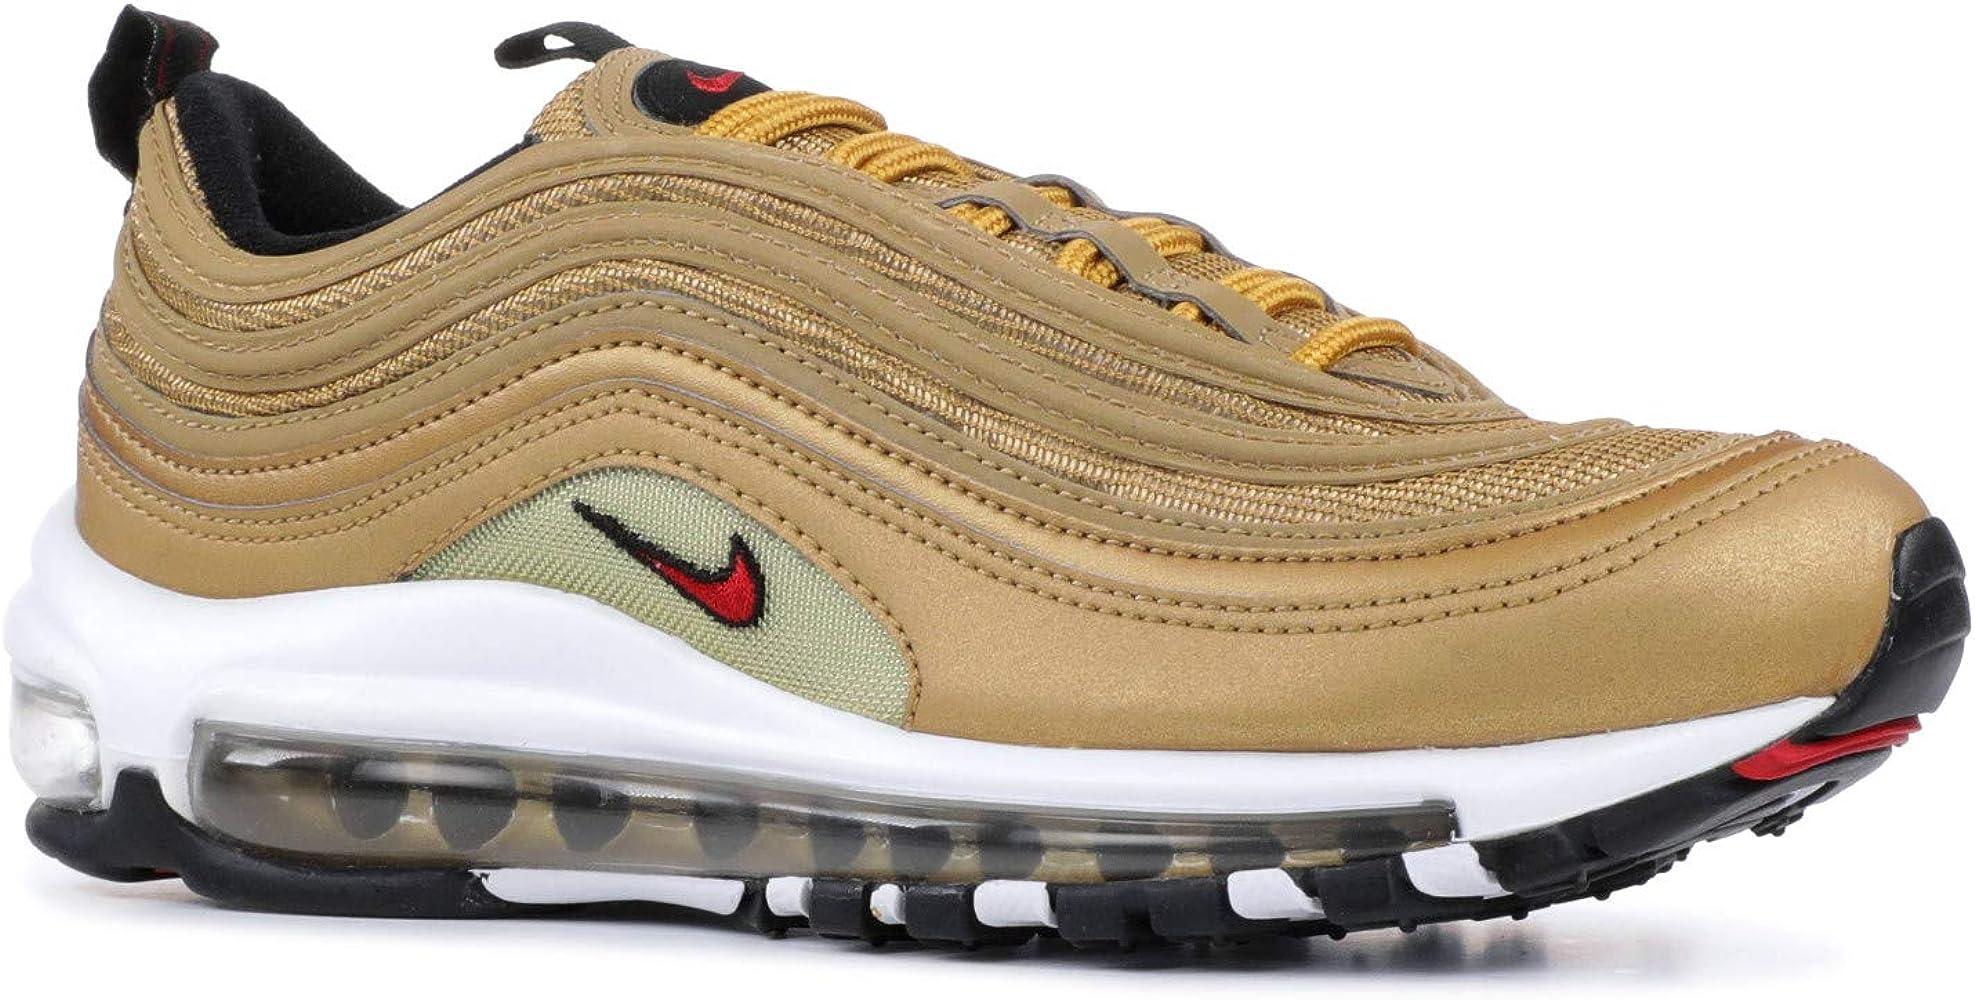 Nike W Air Max 97 OG QS 885691 700